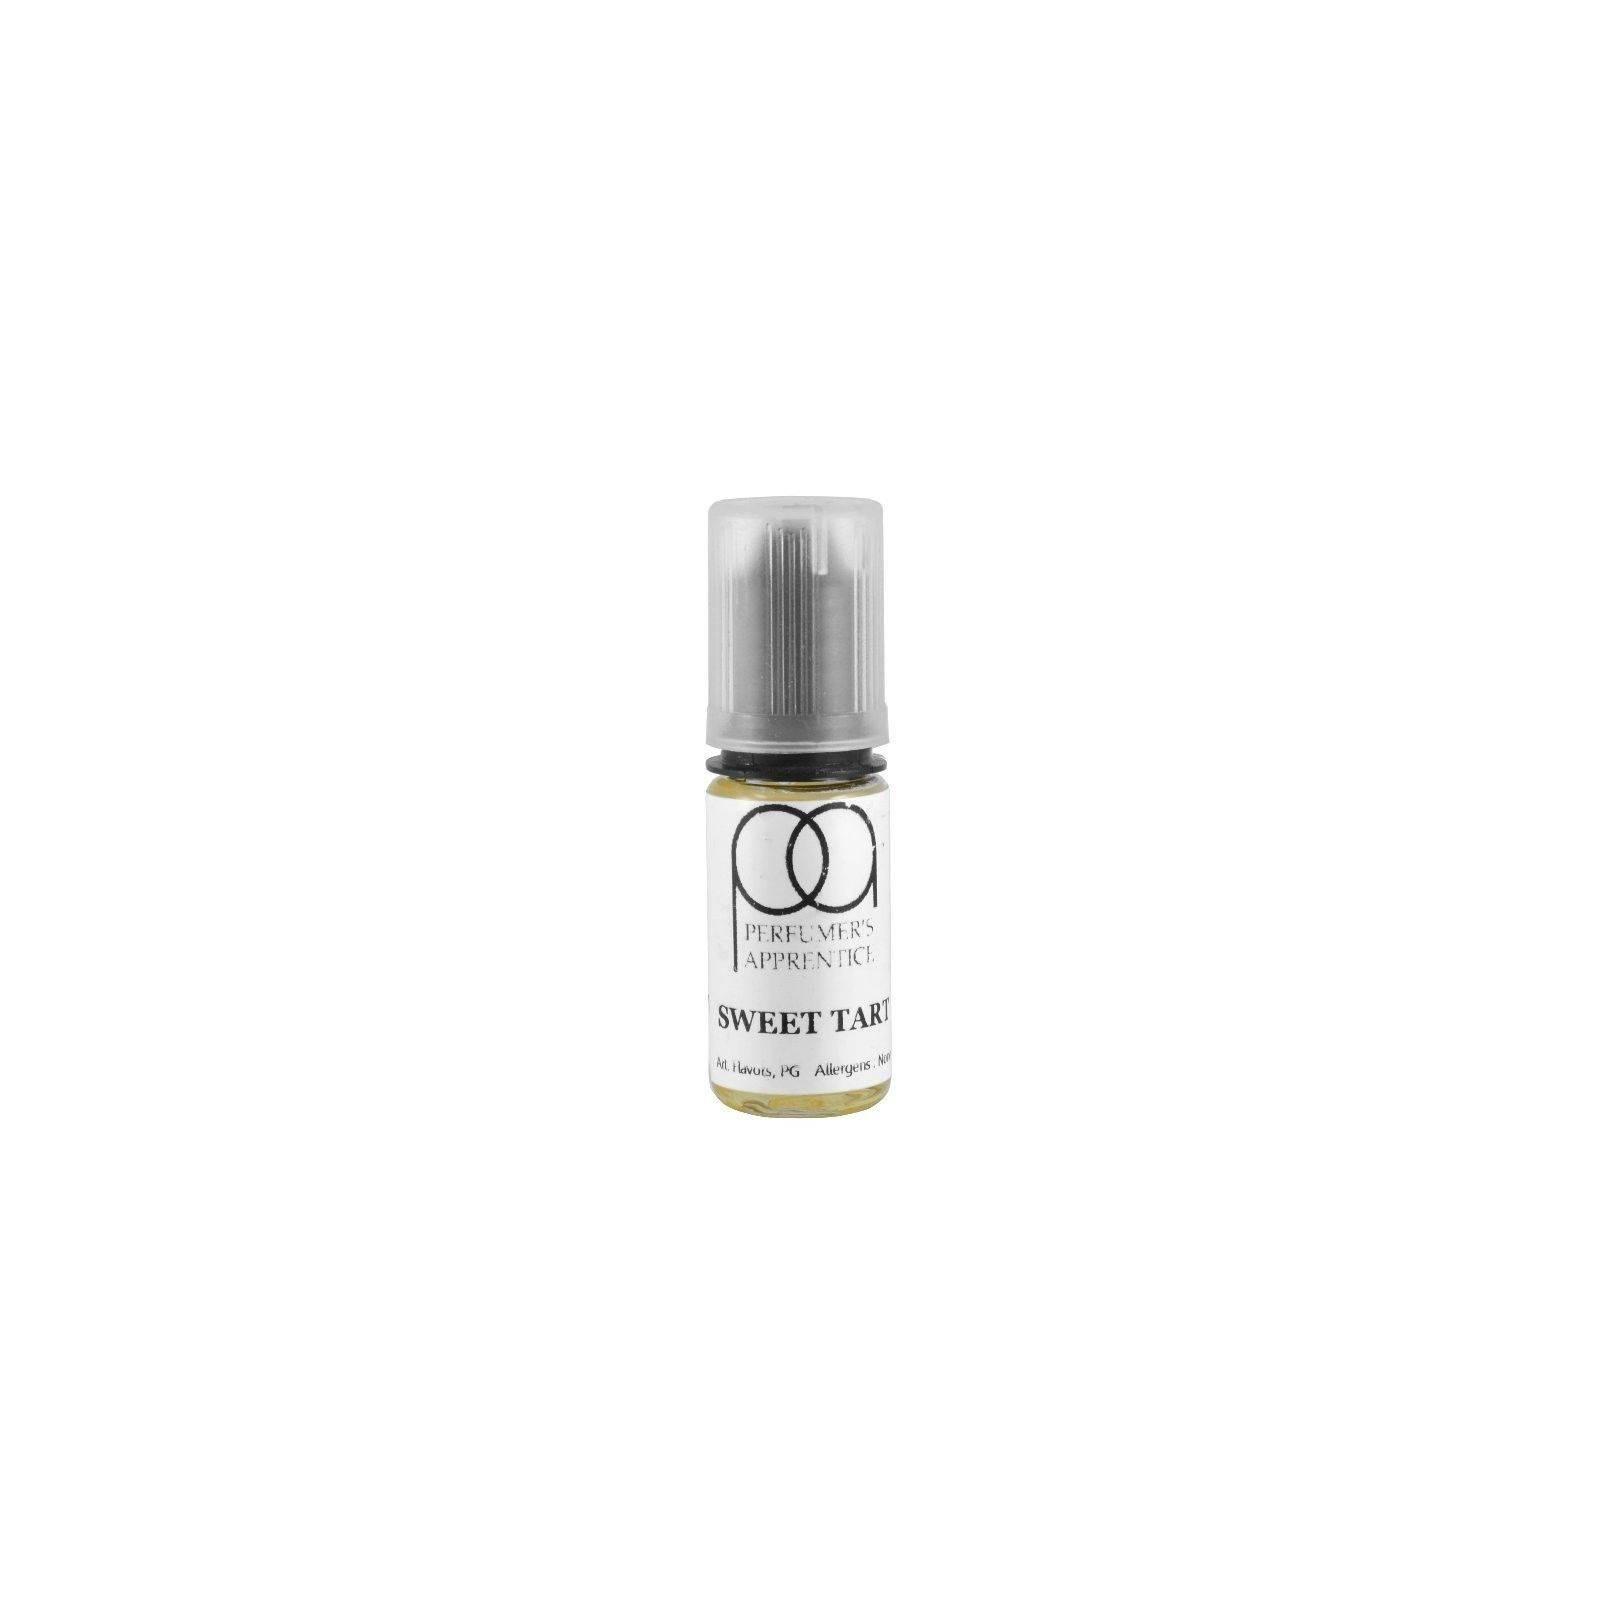 Concentré Sweet & Tart - Perfumer's Apprentice